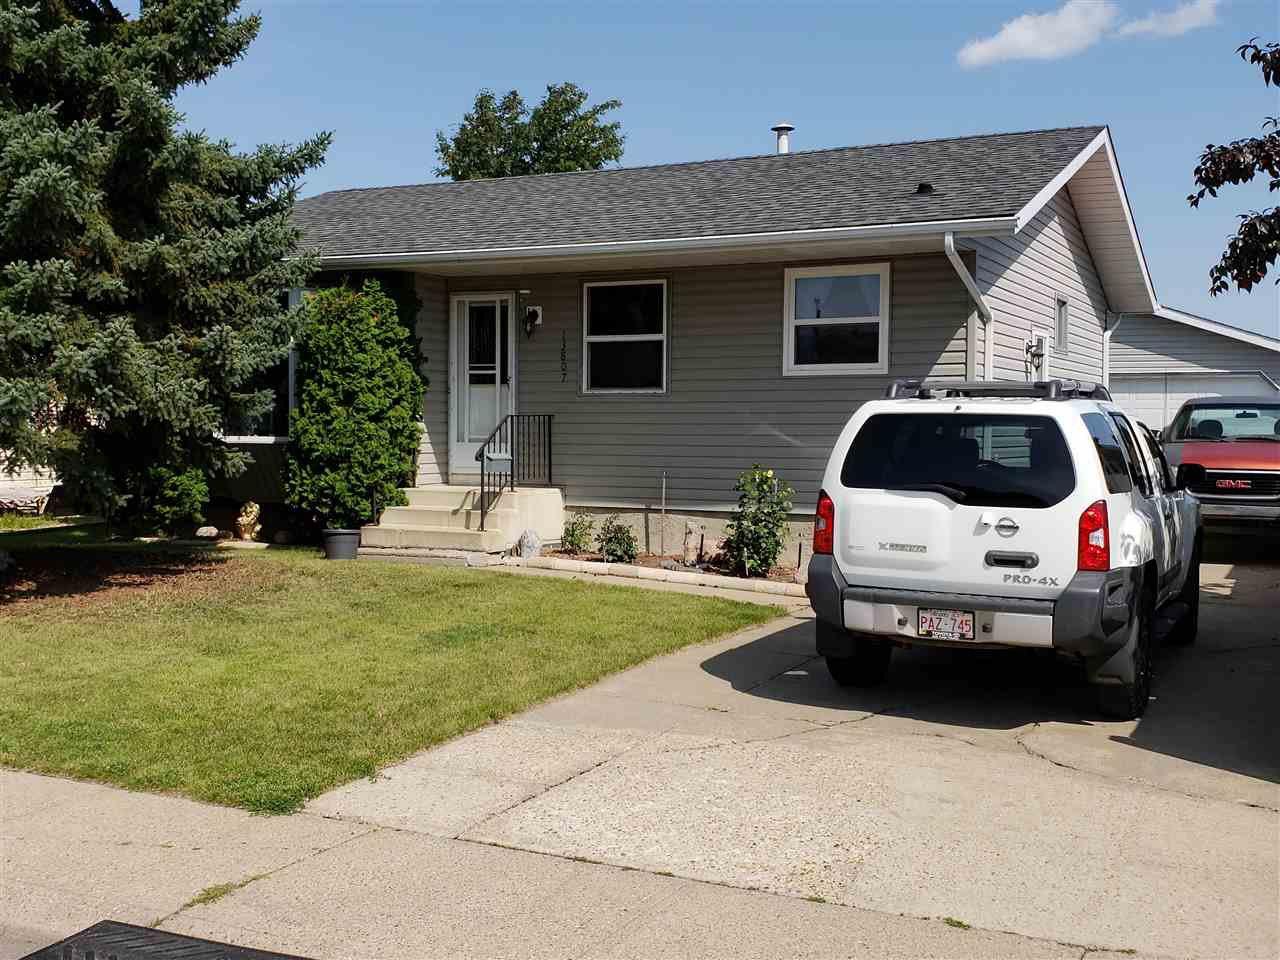 Main Photo: 13807 26 Street in Edmonton: Zone 35 House for sale : MLS®# E4170176